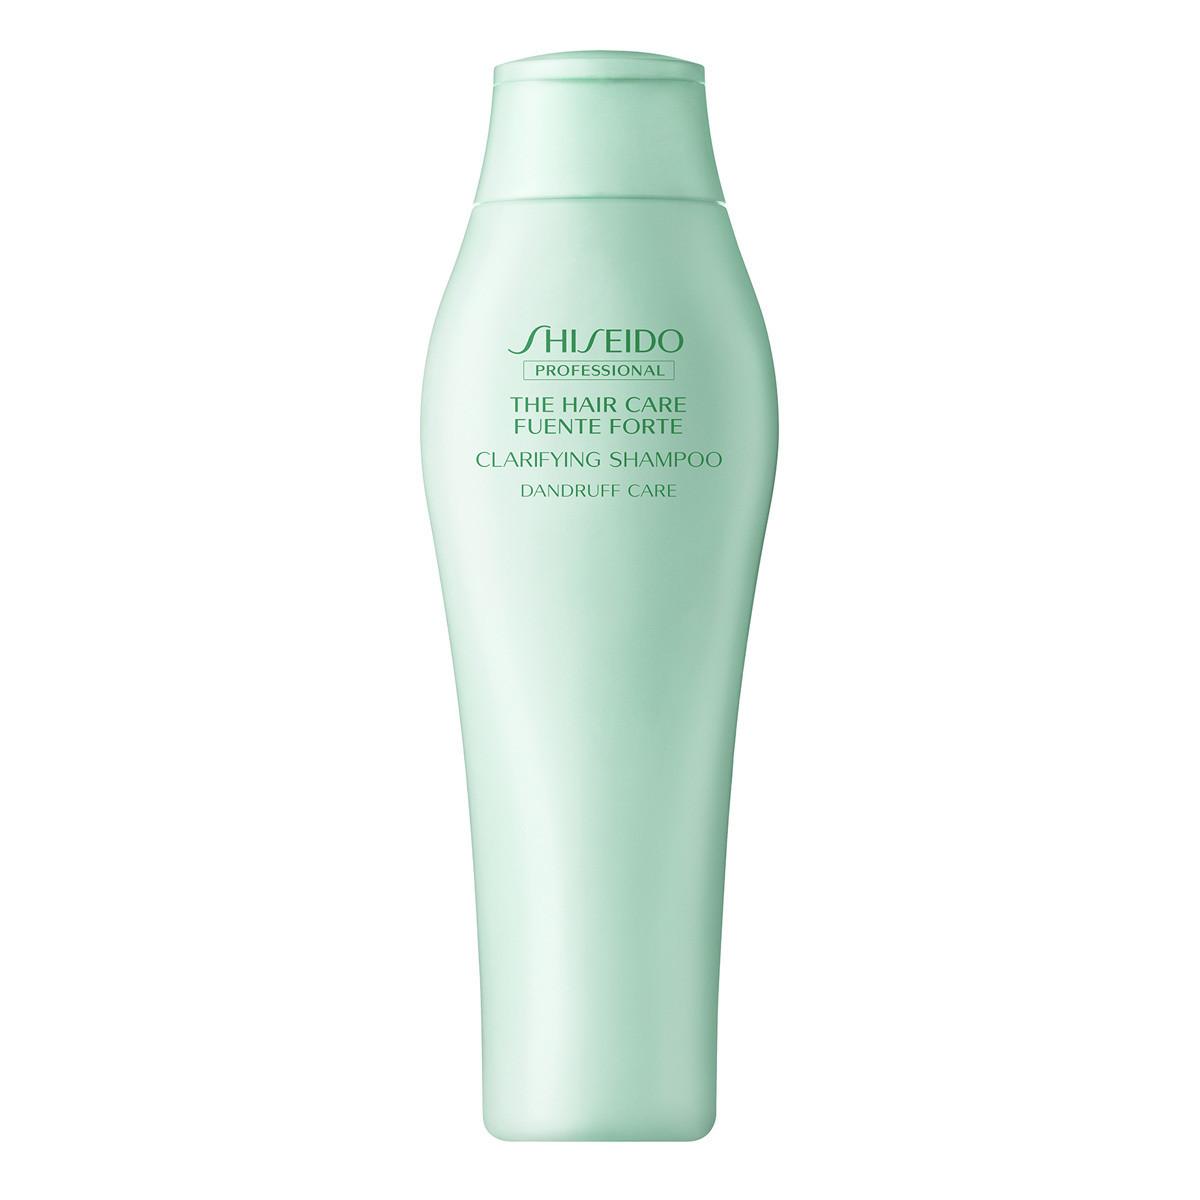 Шампунь для волосся проти лупи Shiseido Professional Fuente Forte Dandruff Care Shampoo, 250 мл